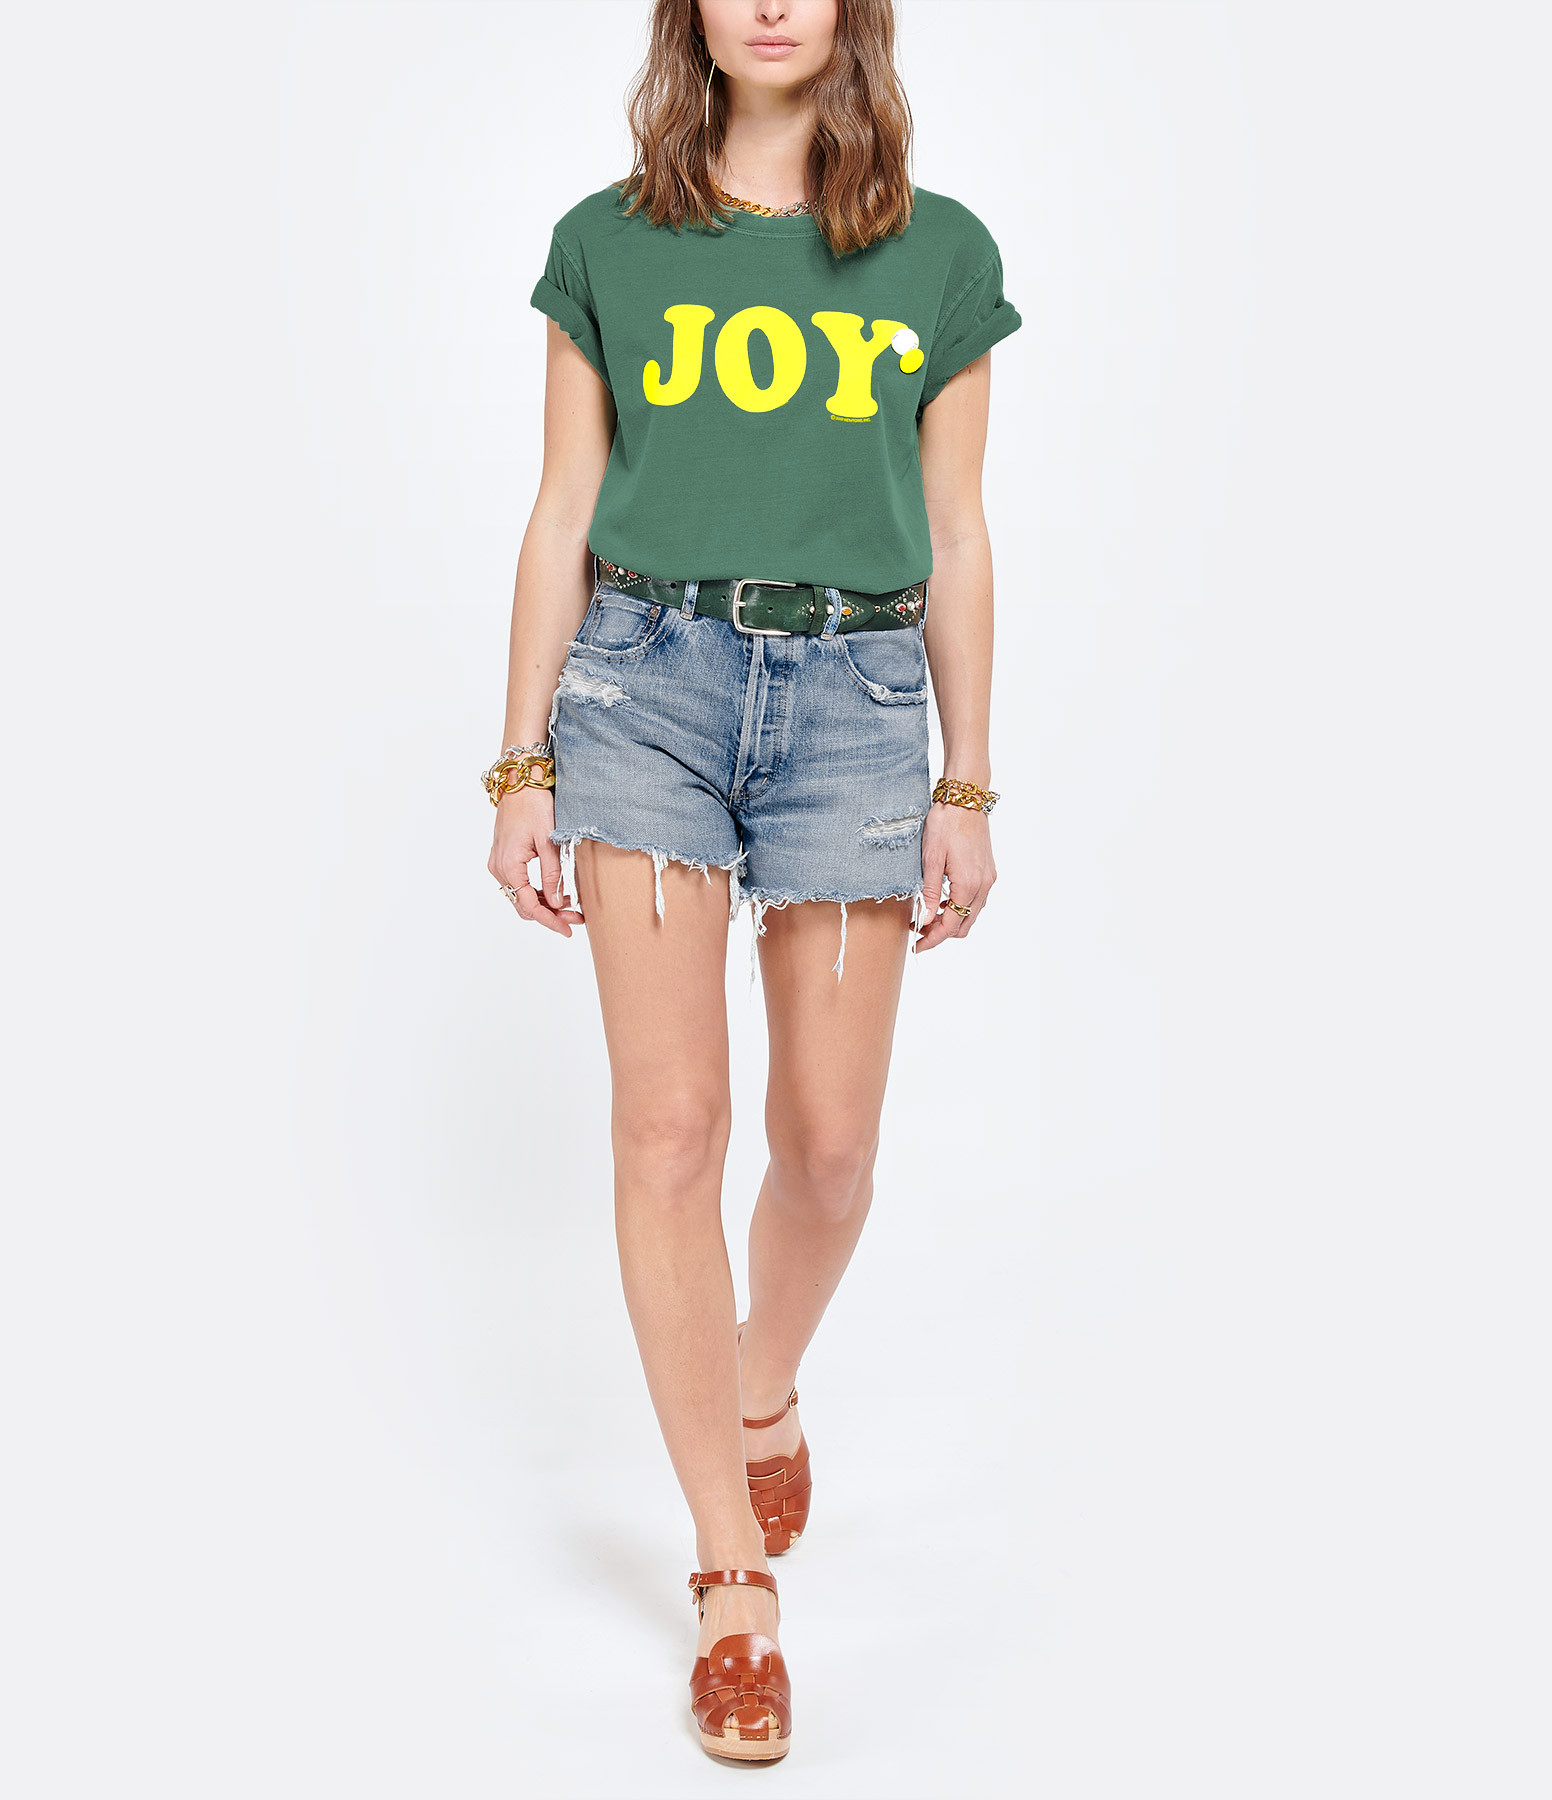 NEWTONE - Tee-shirt Trucker Joy Coton Vert Clair